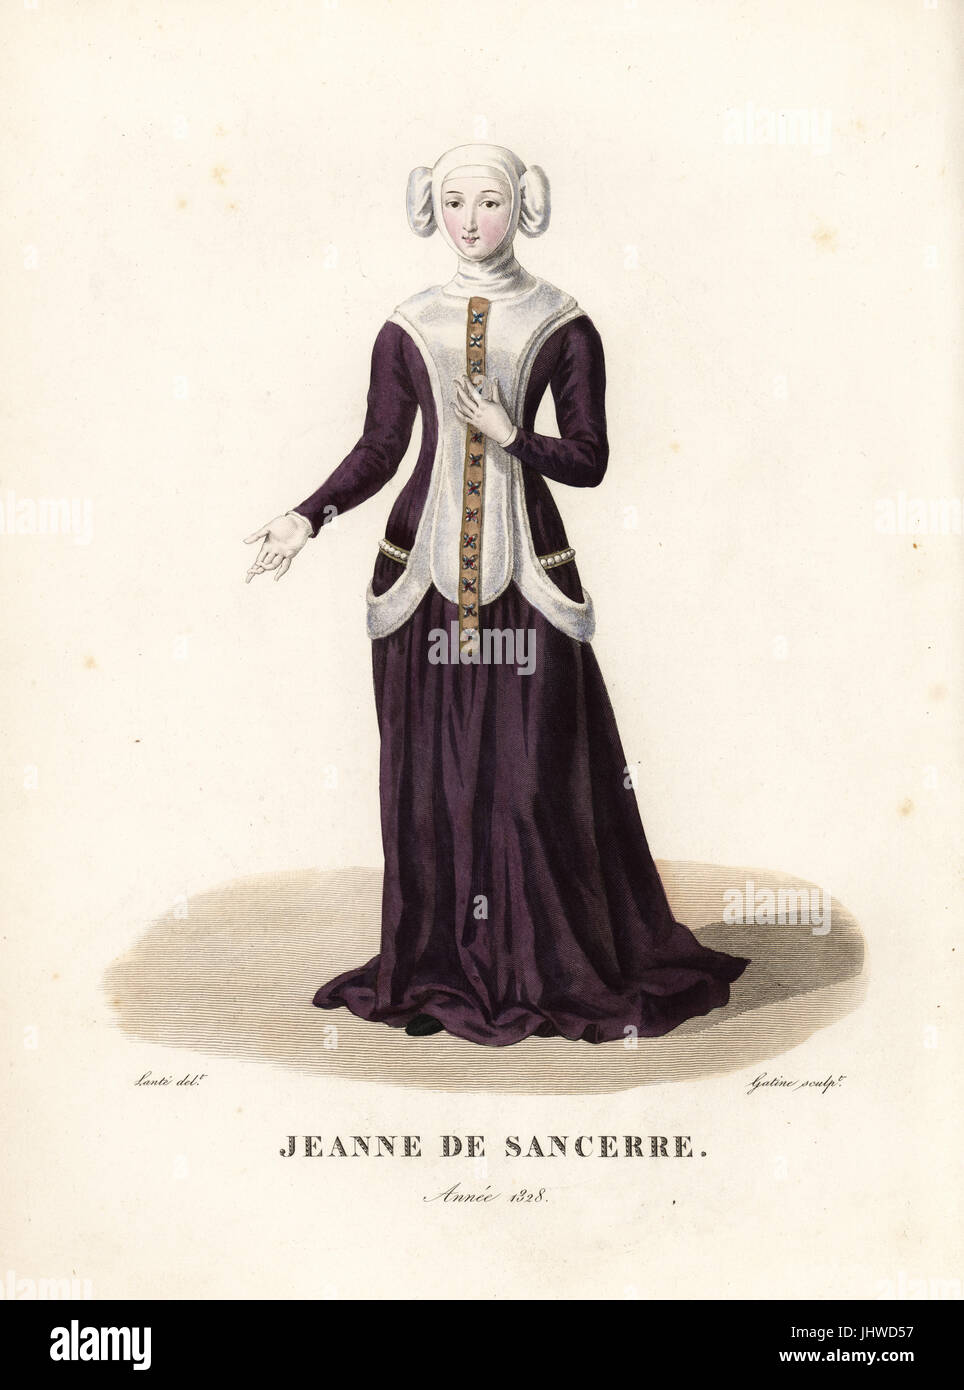 Jeanne de Sancerre, sister of Louis de Sancerre, Constable of France. Handcoloured copperplate engraving by Georges - Stock Image